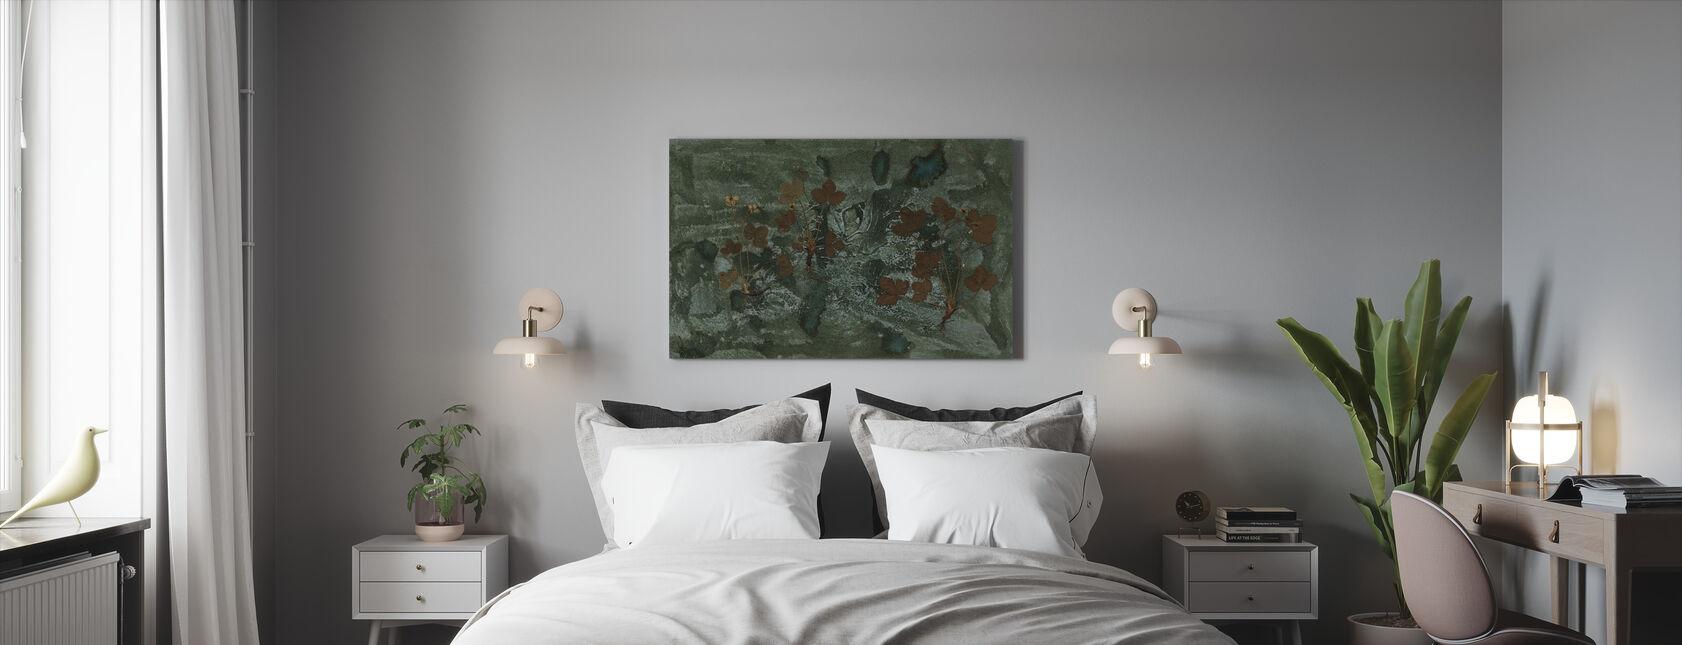 Bibi - Canvas print - Bedroom